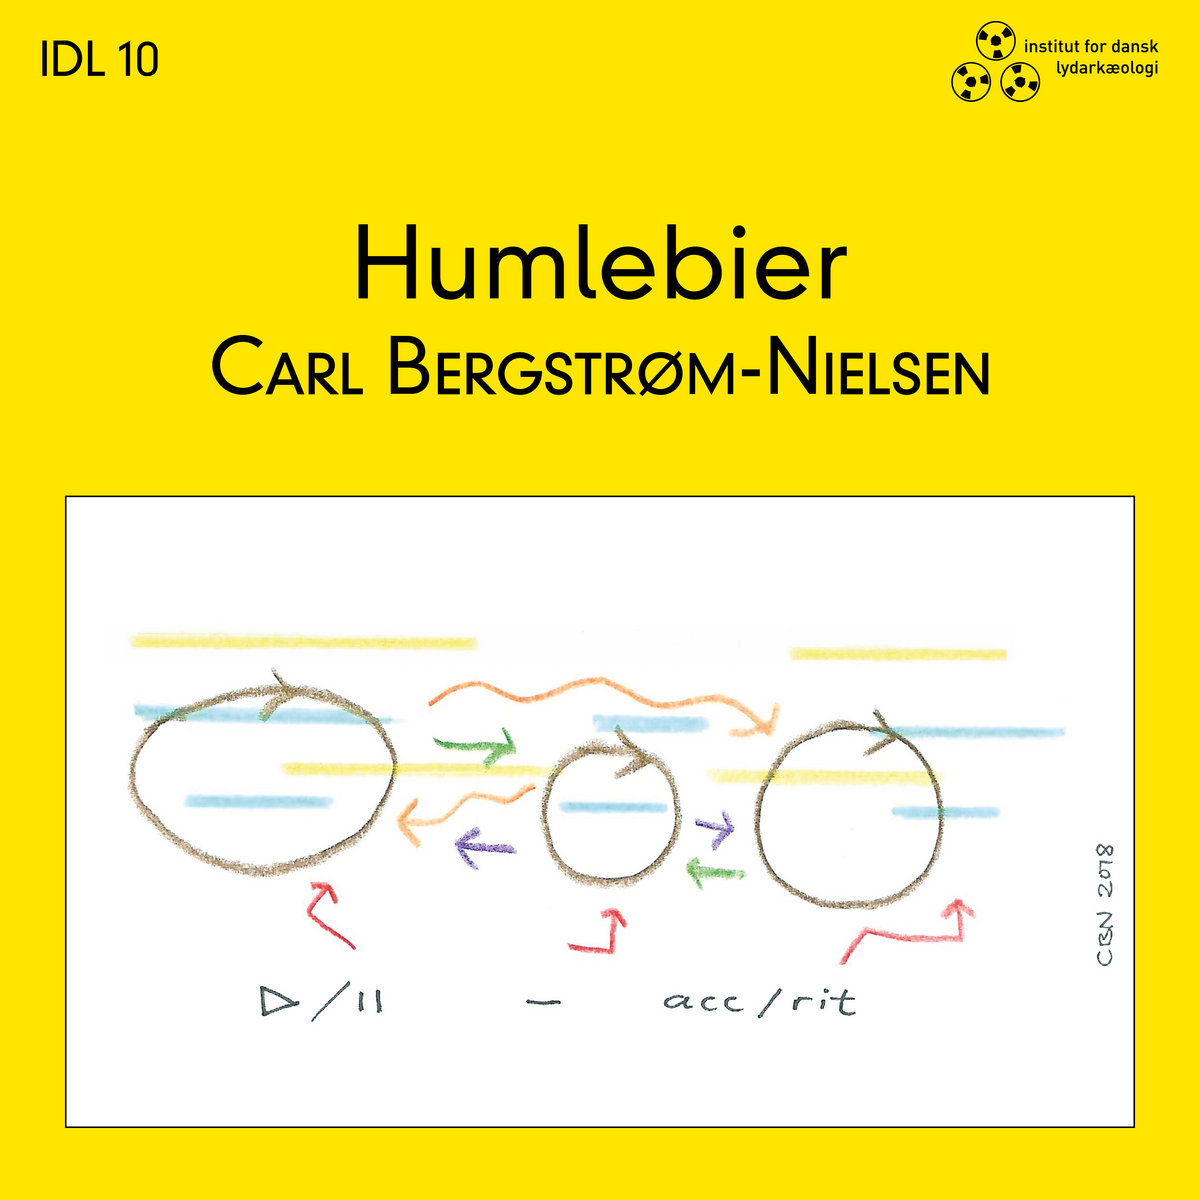 Humlebier